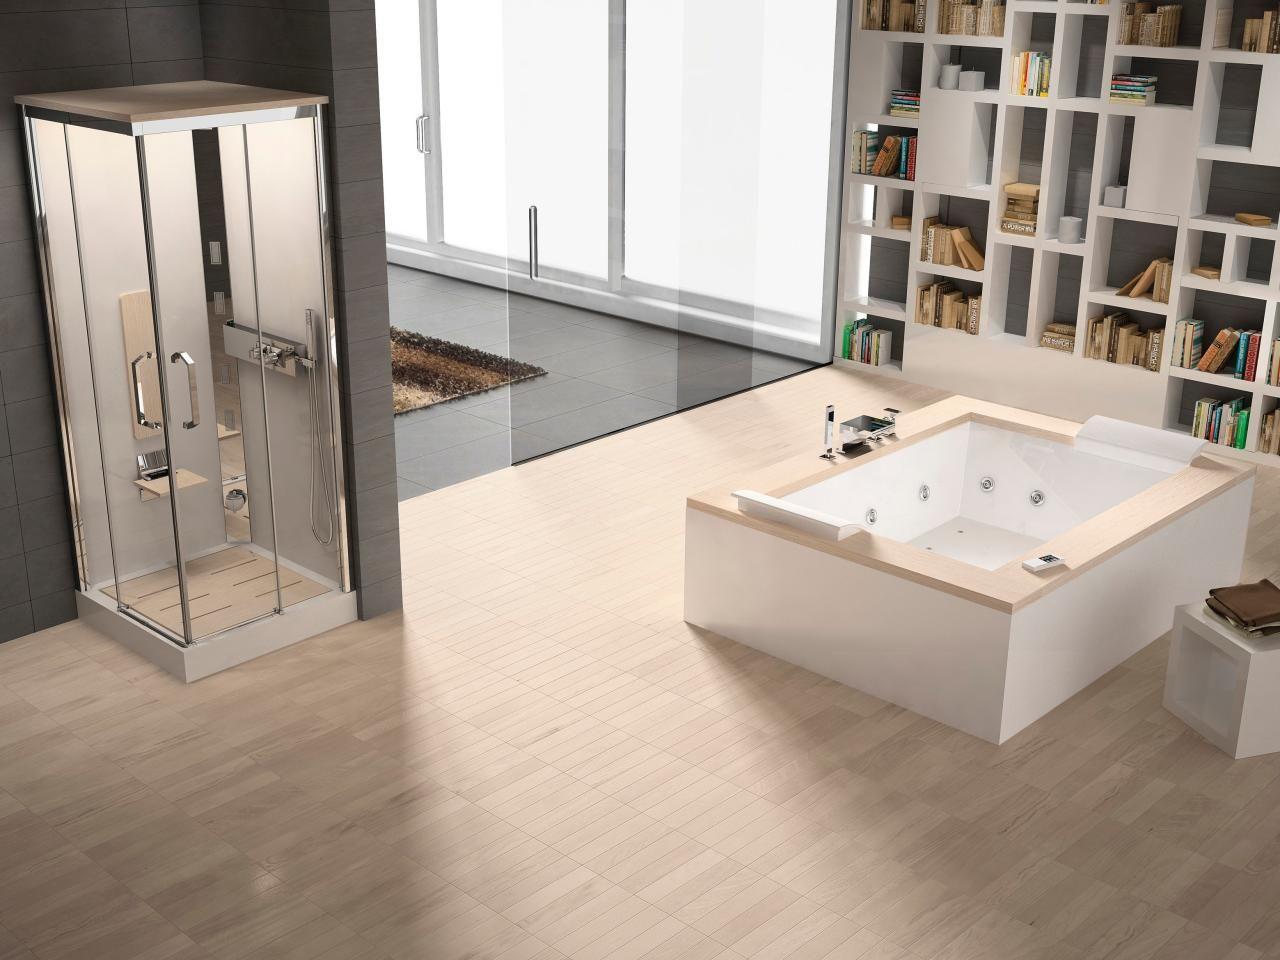 How to Choose a Bathtub | Bathrooms | Pinterest | Bathtubs, Hgtv and ...